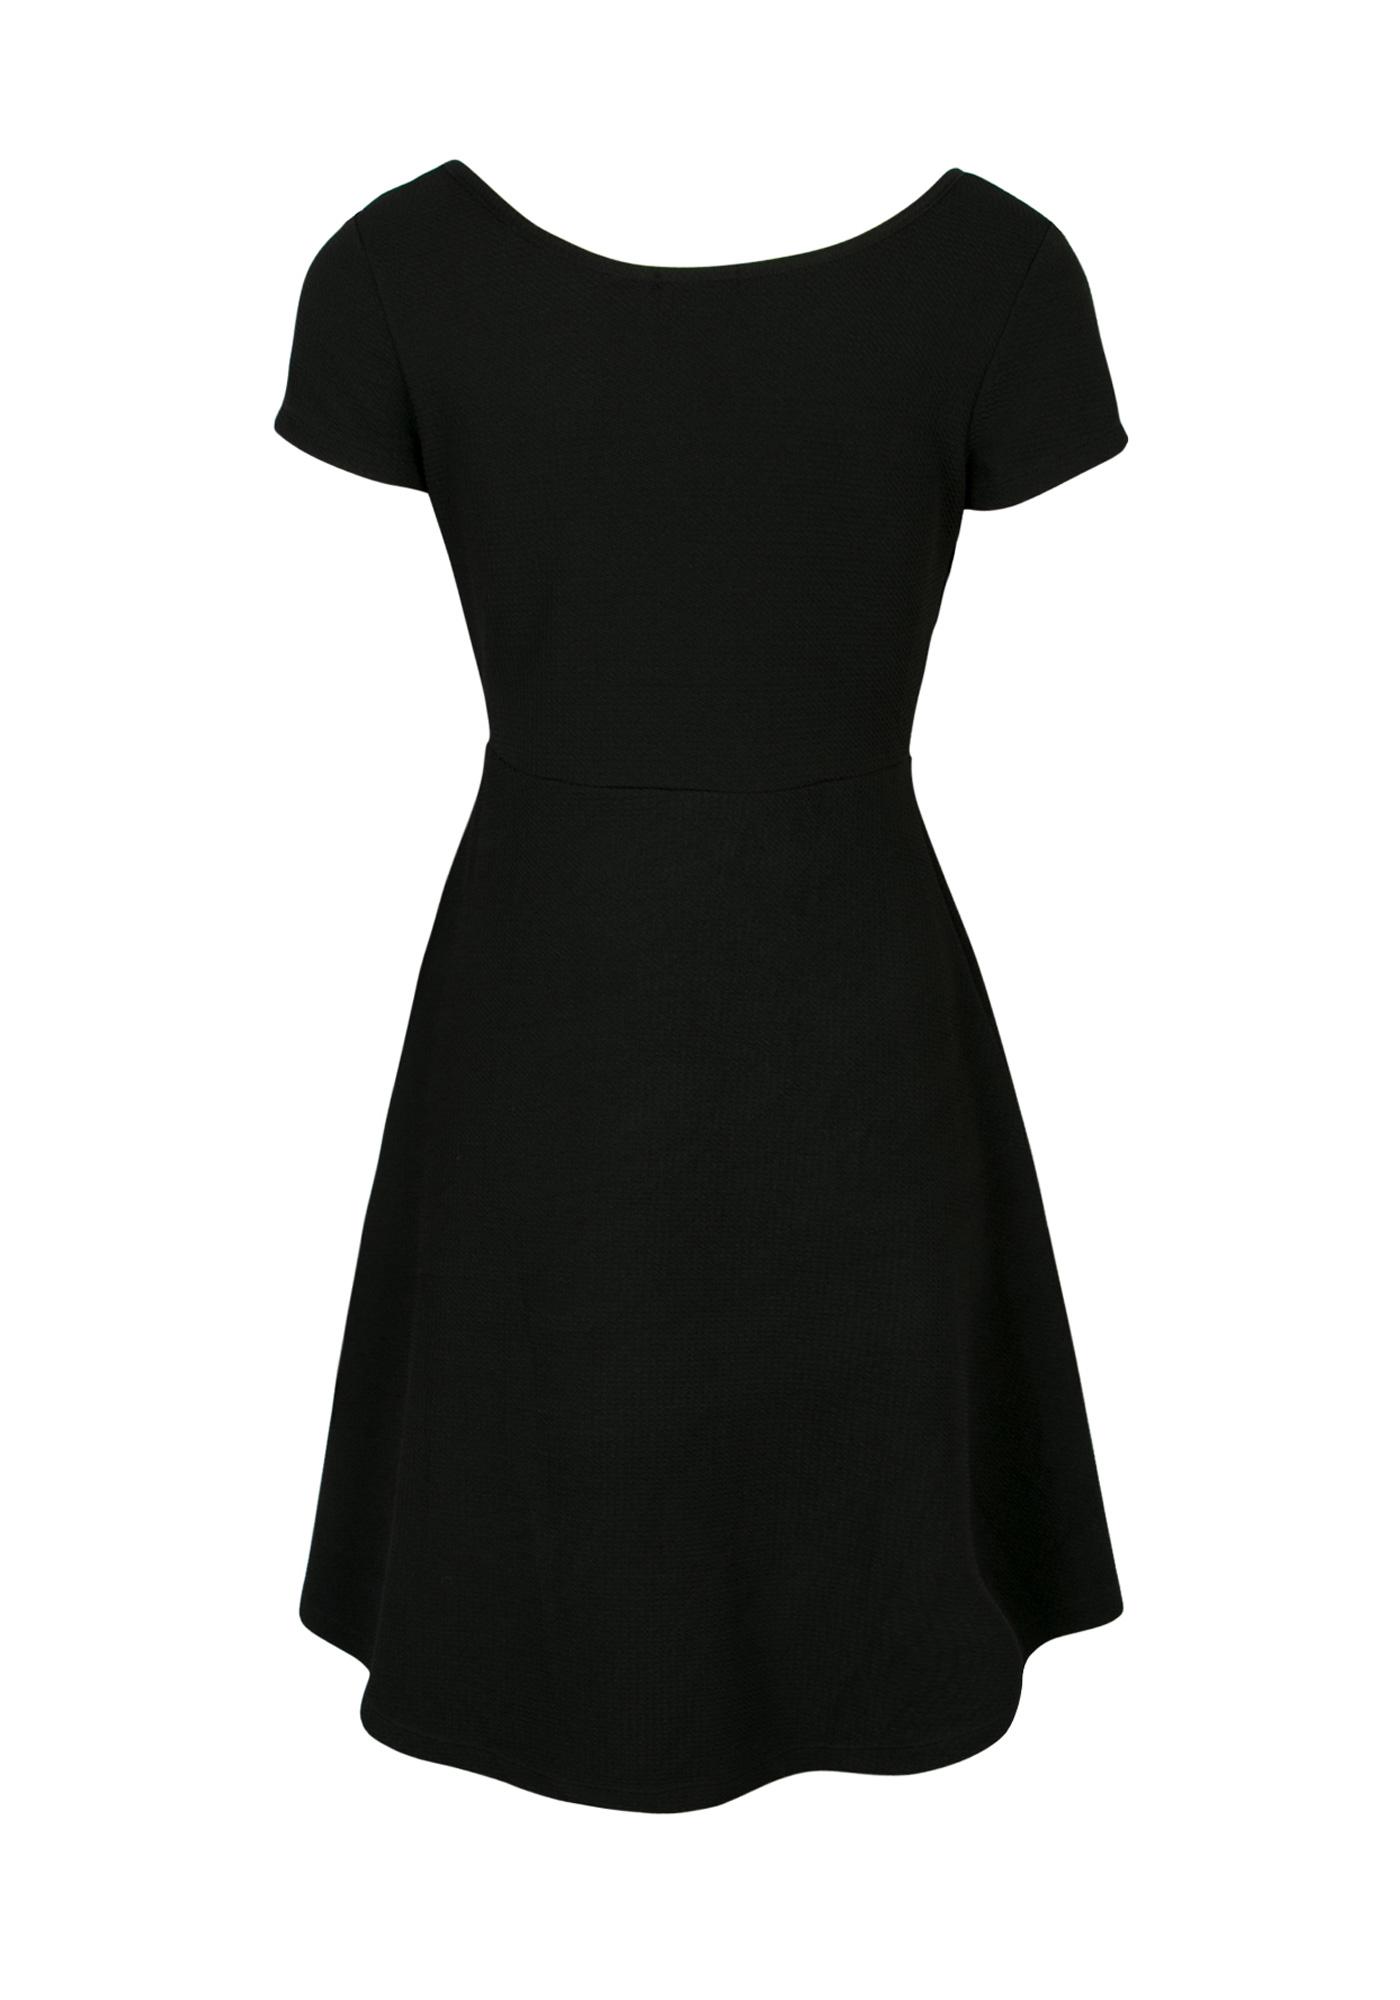 b4018fd1a2c ... Ladies Cap Sleeve Skater Dress